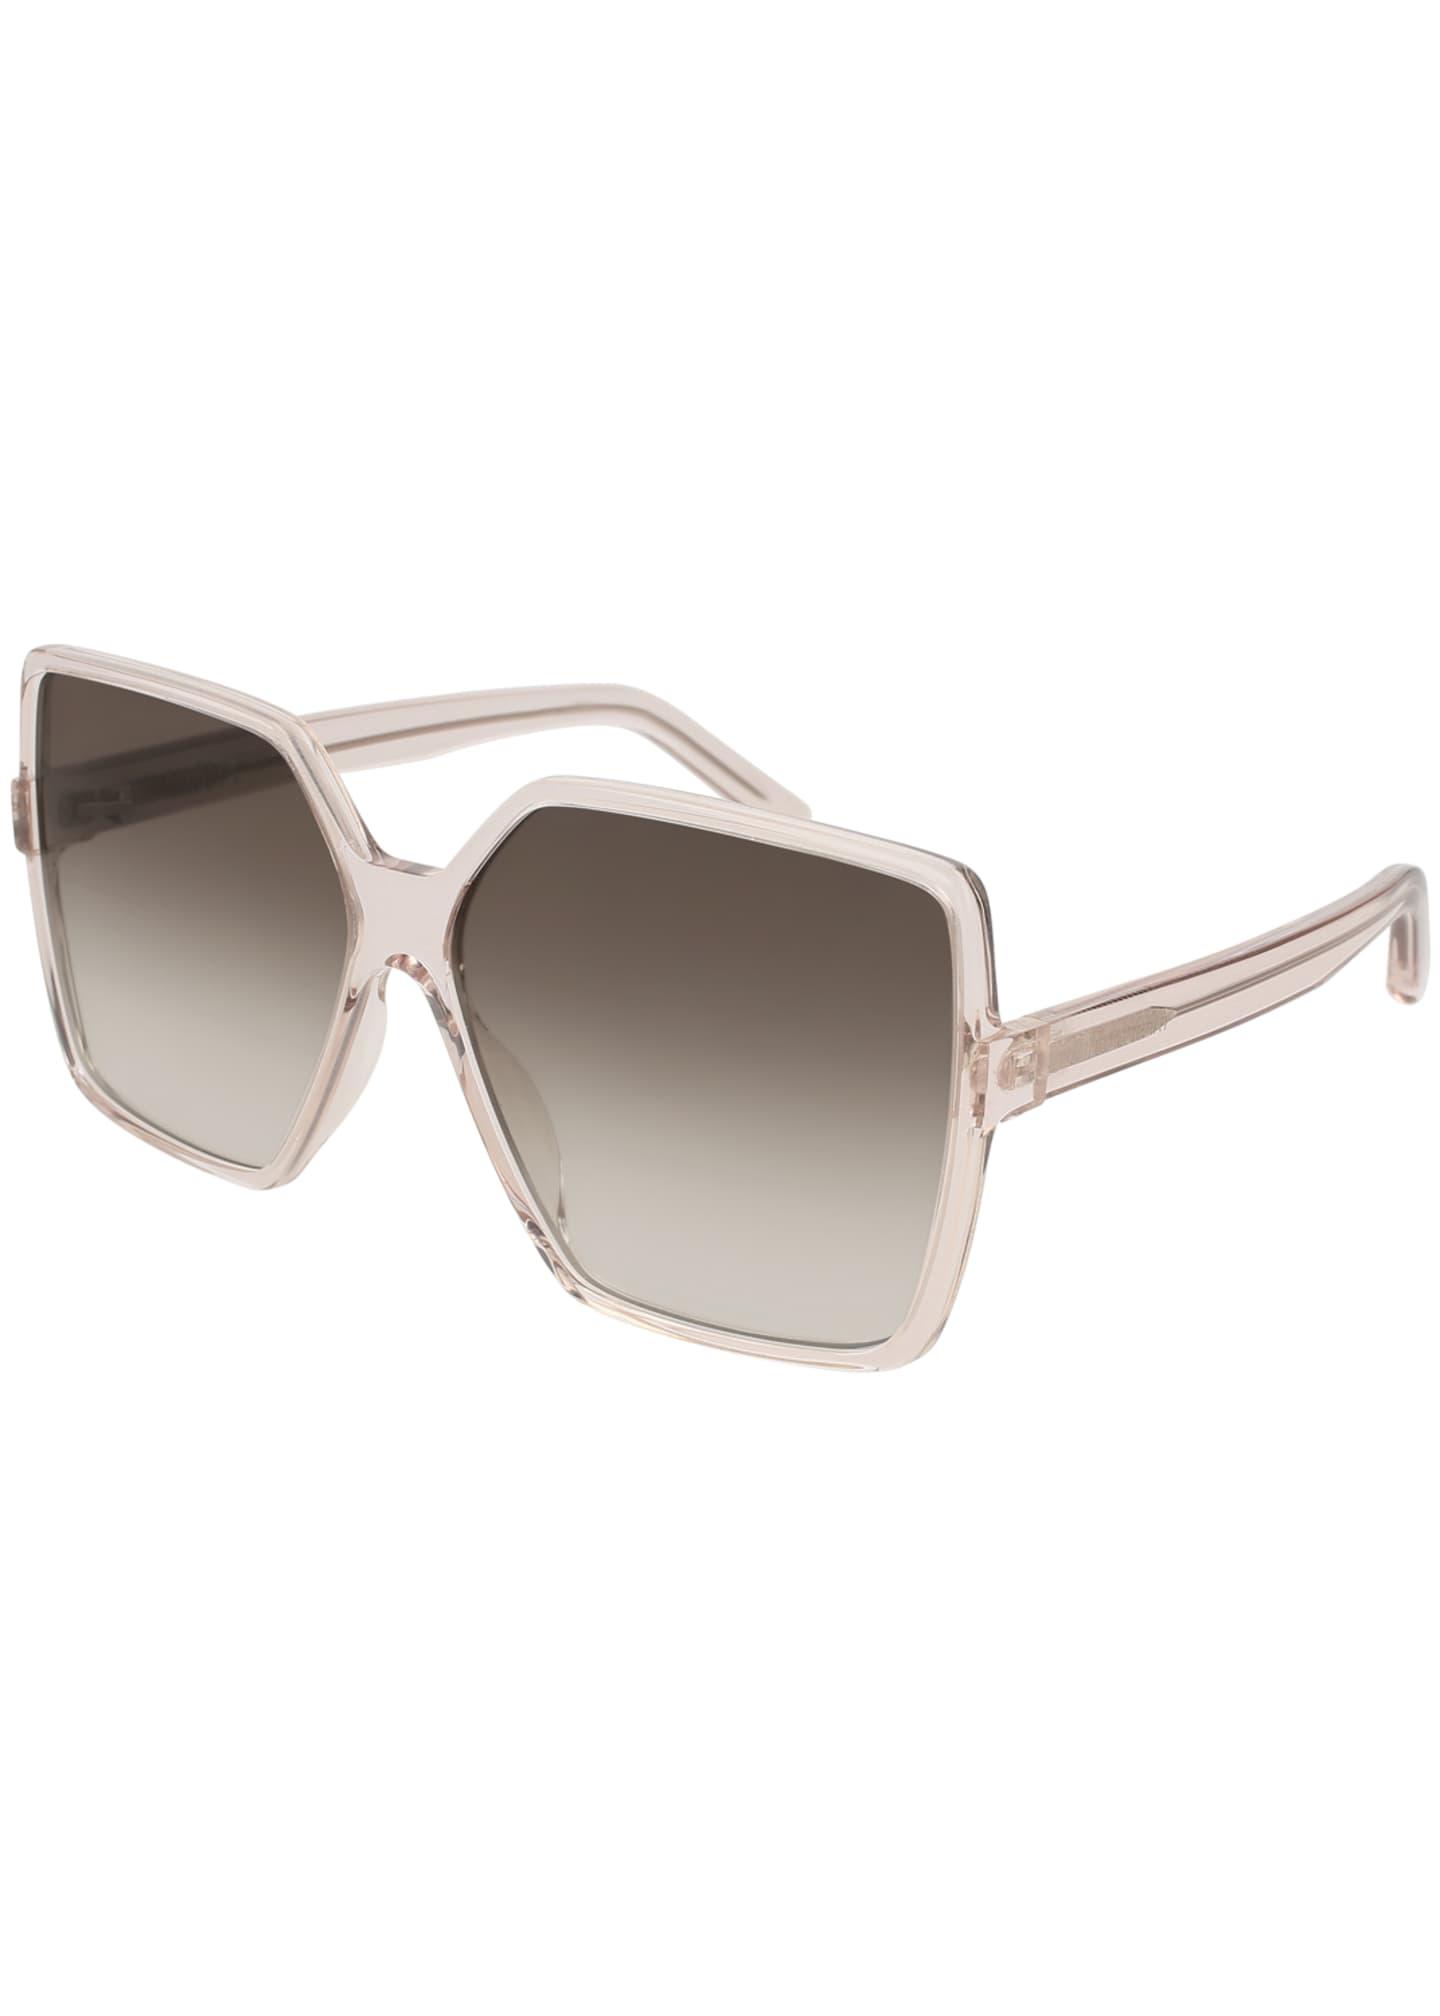 Oversized XL Square Clear Sunglasses - Sunglass Holic